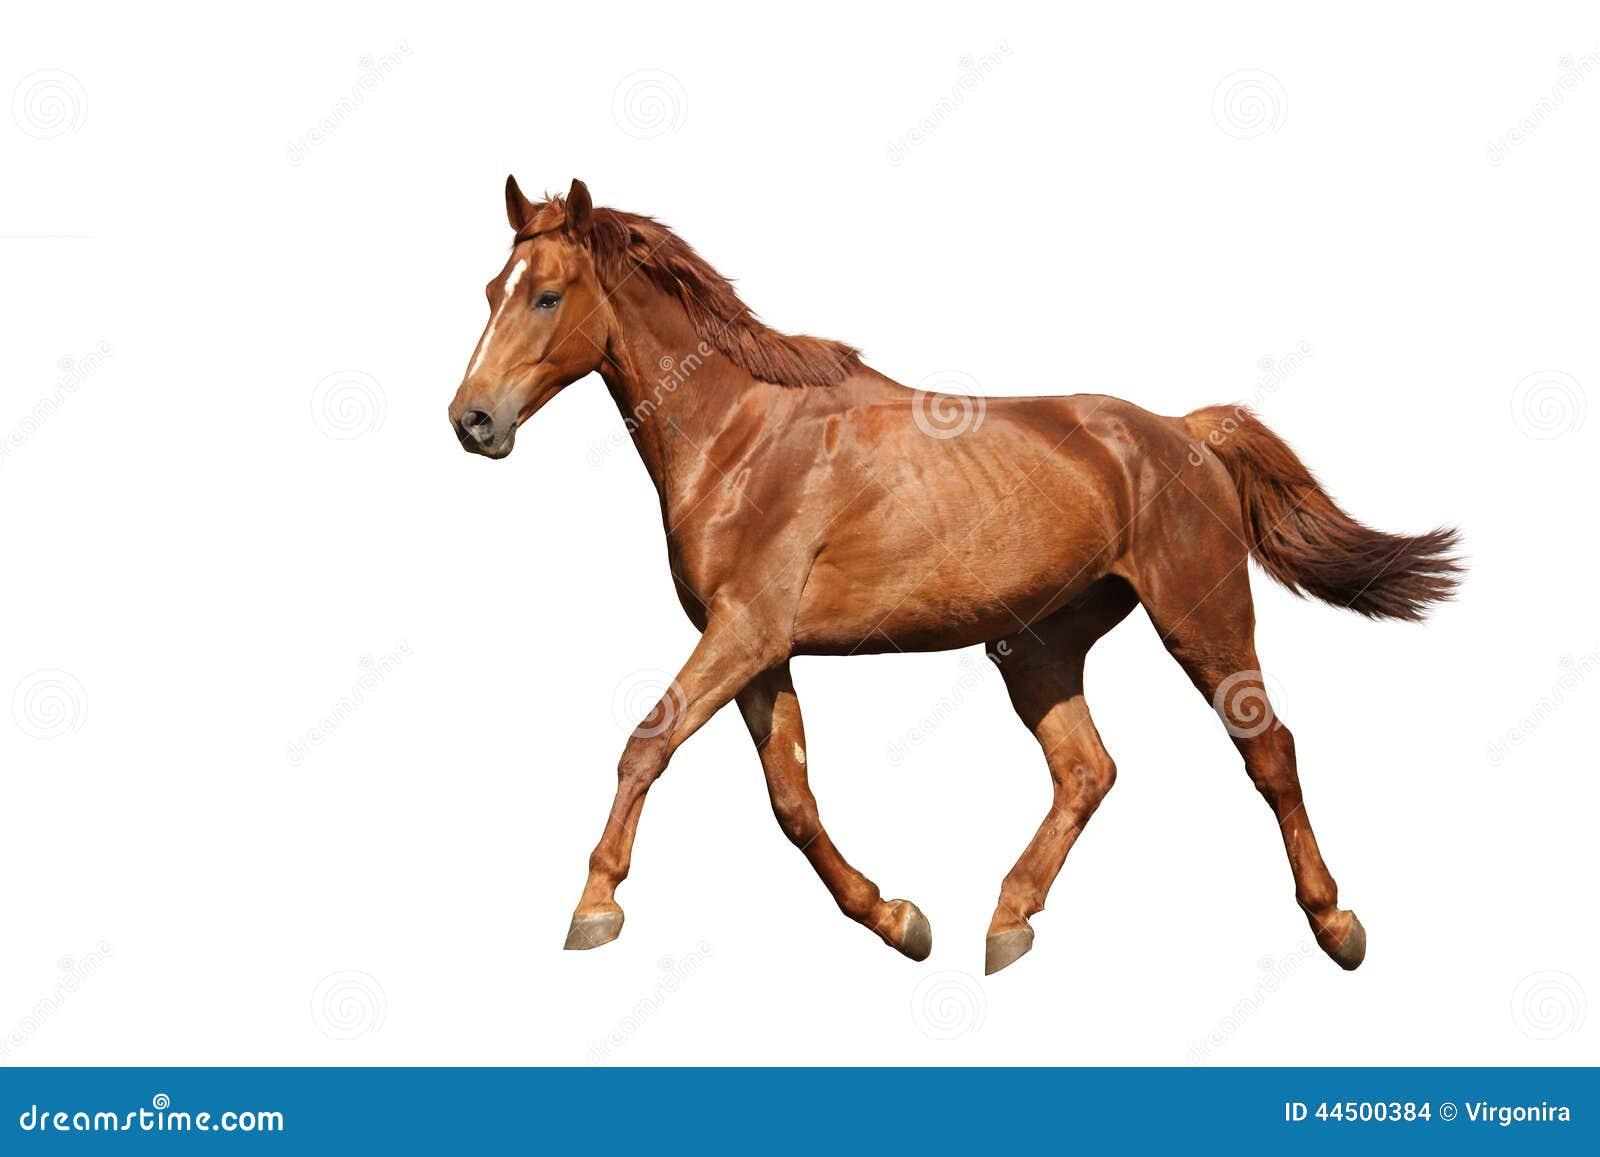 Chestnut Brown Horse Running Free On White Background ...